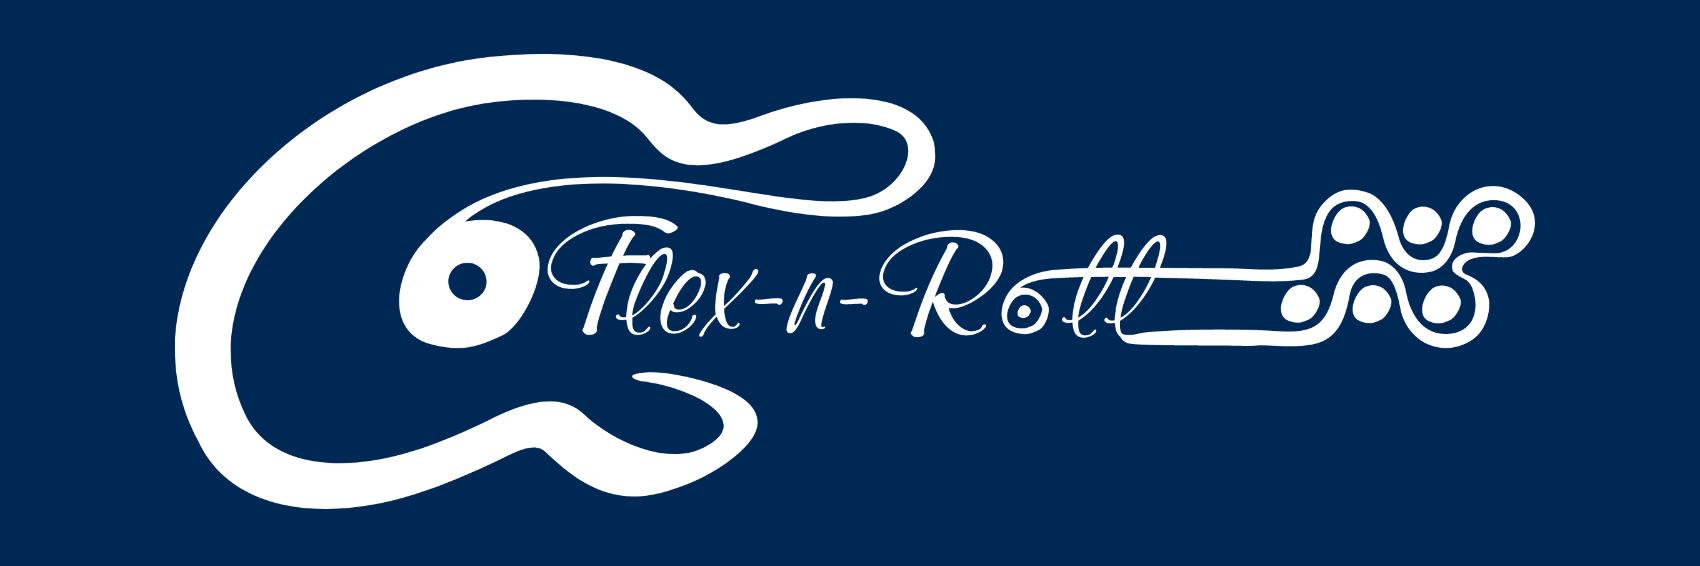 логотип Flex-n-Roll